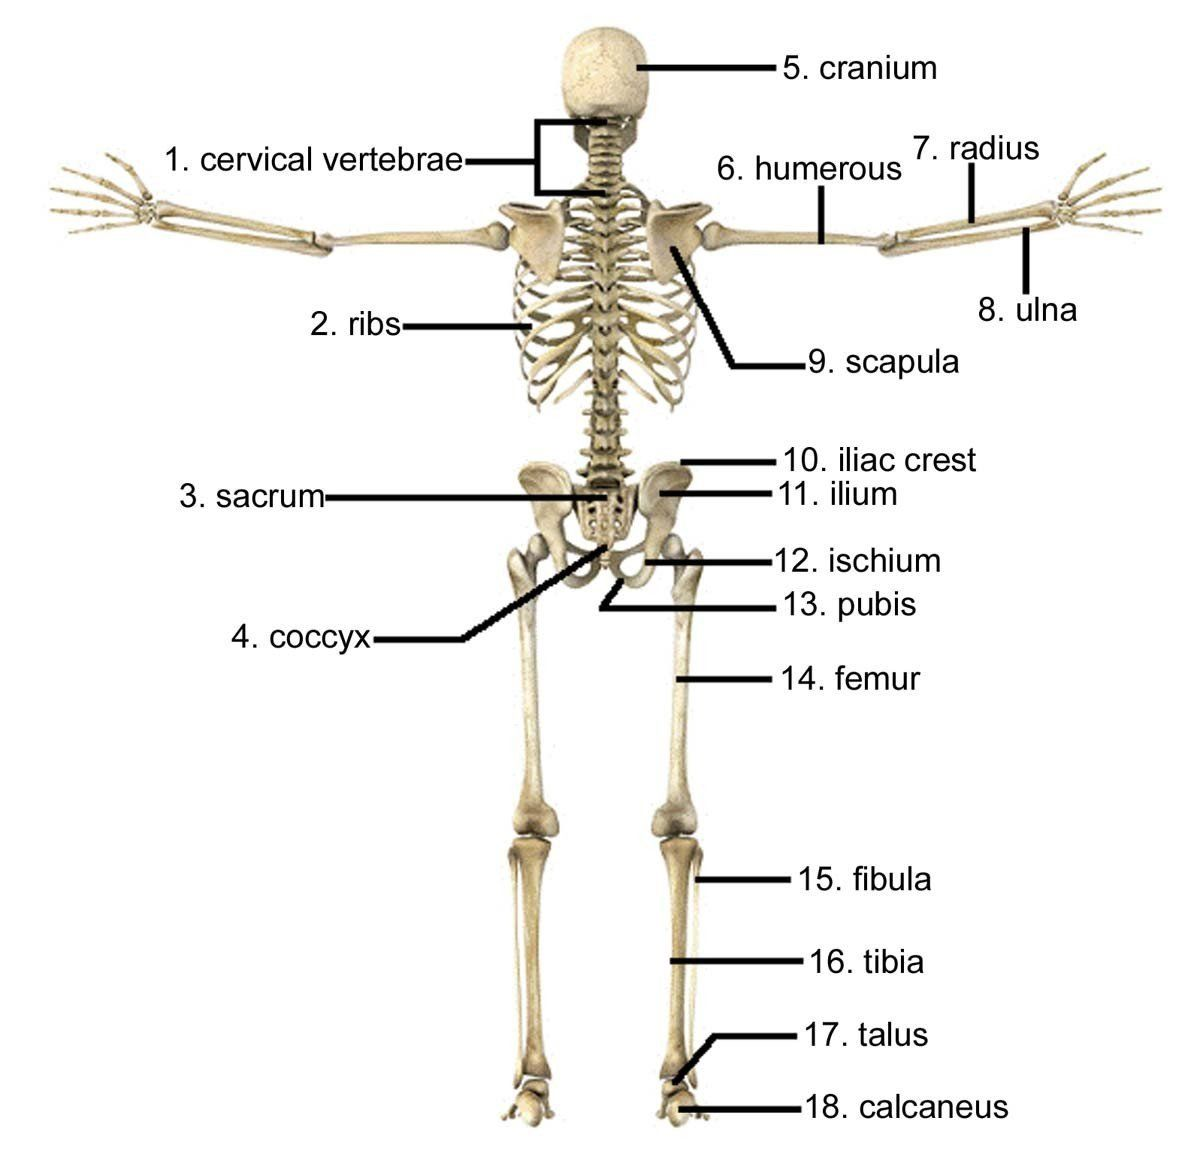 Labeling The Skeleton Worksheet Axial Skeleton Labeling Worksheets Human Skeletal System Skeletal System Body Diagram